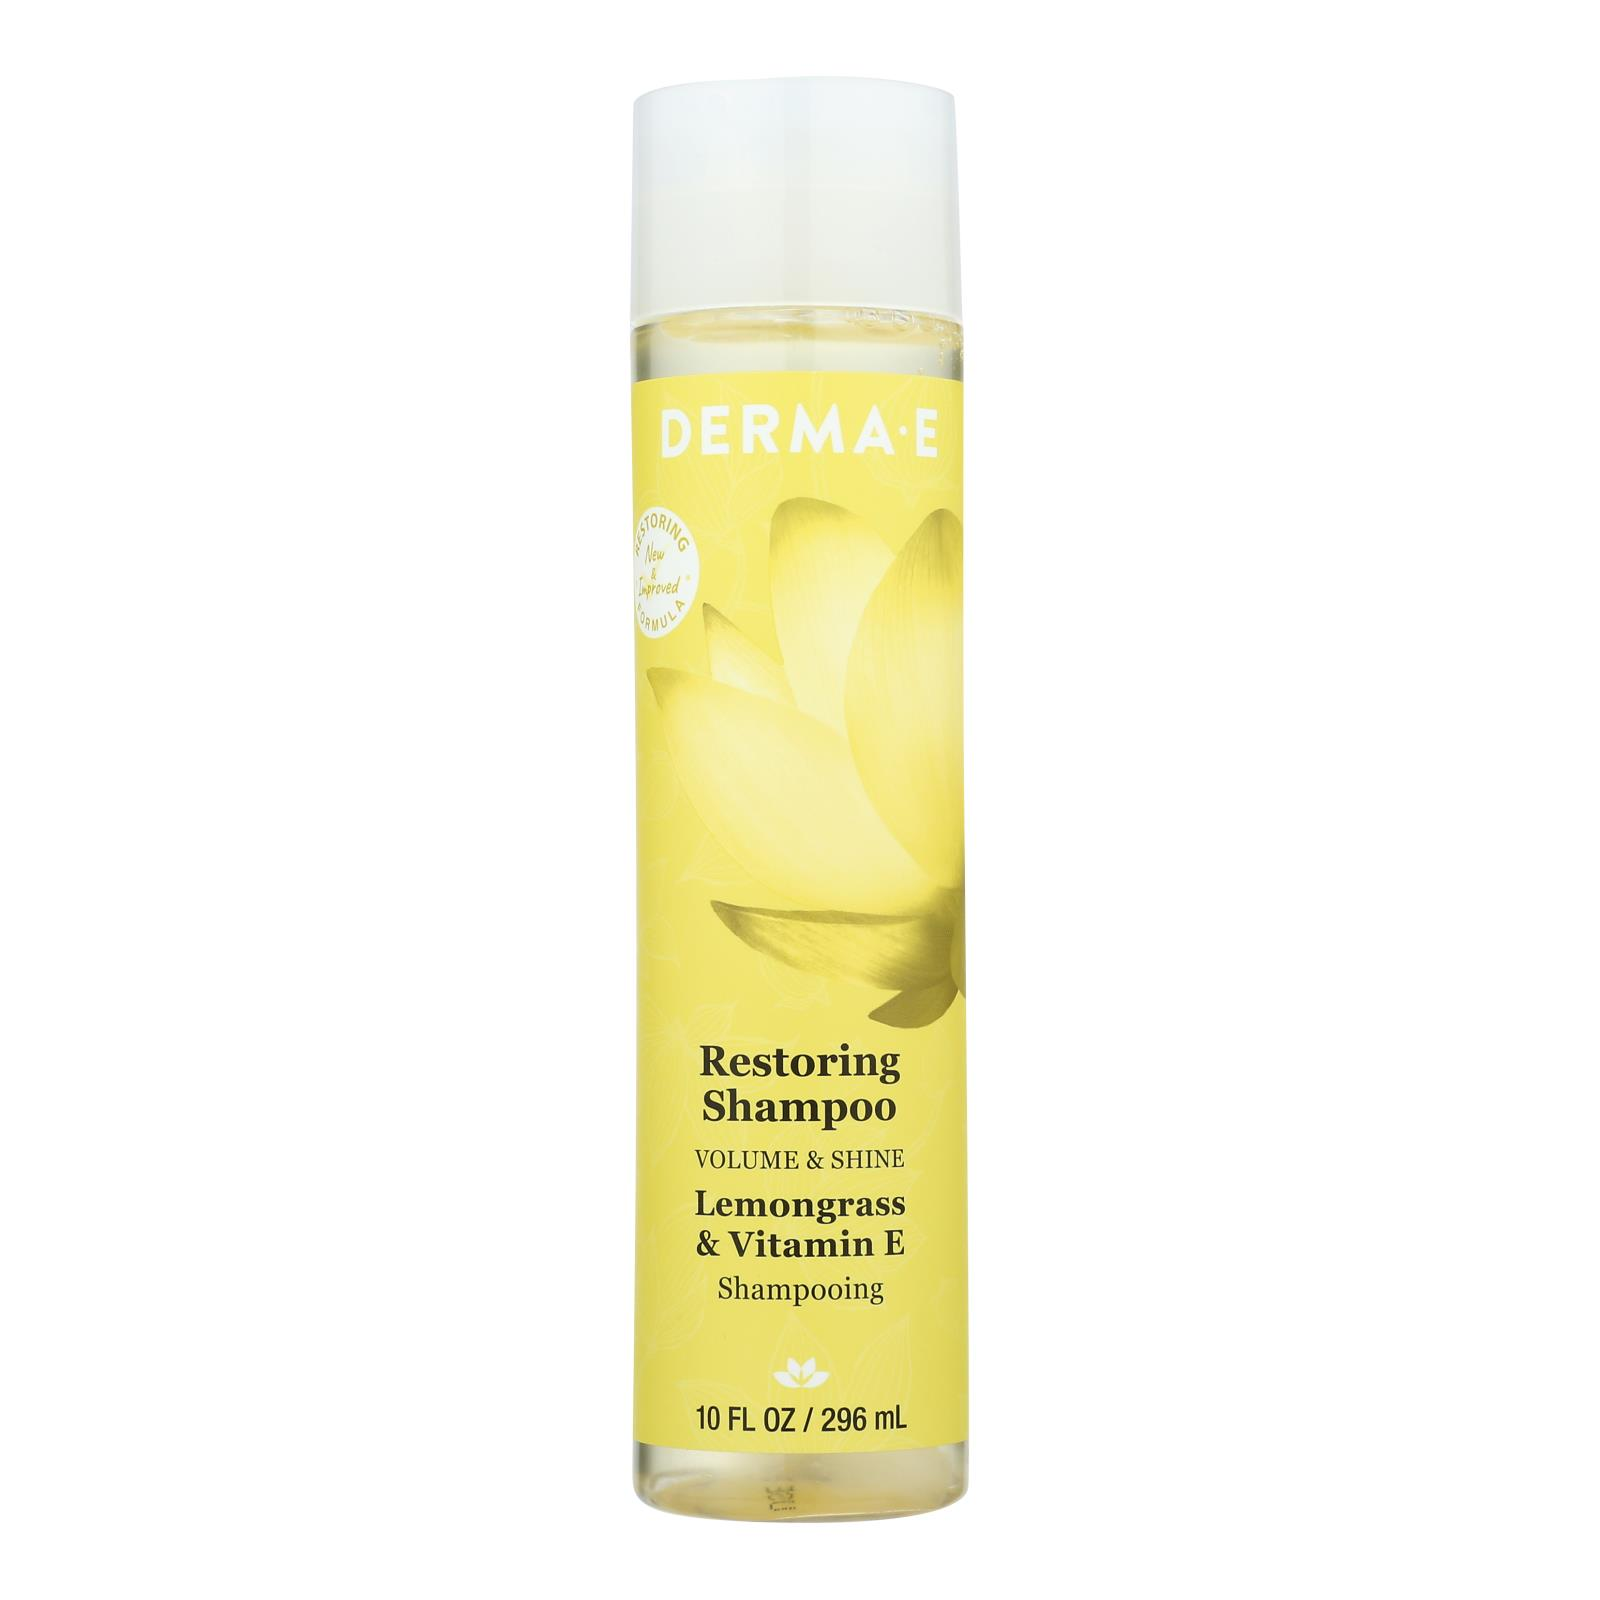 Derma-E Volume & Shine Restoring Shampoo, Lemongrass & Vitamin E  - 1 Each - 10 FZ